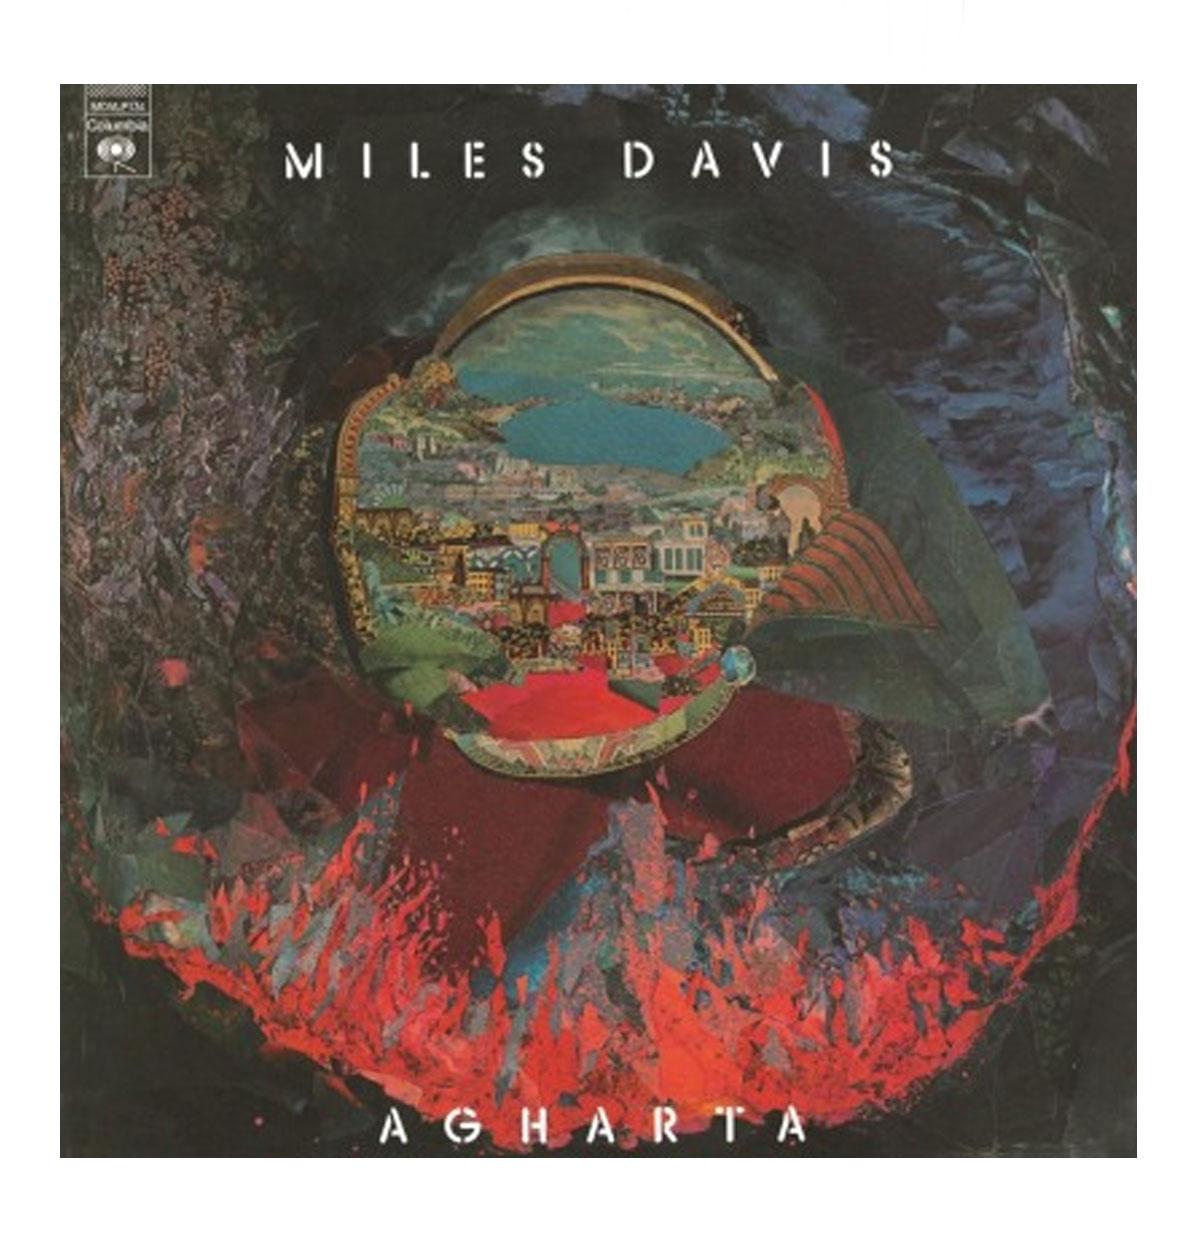 Miles Davis - Agharta 2LP